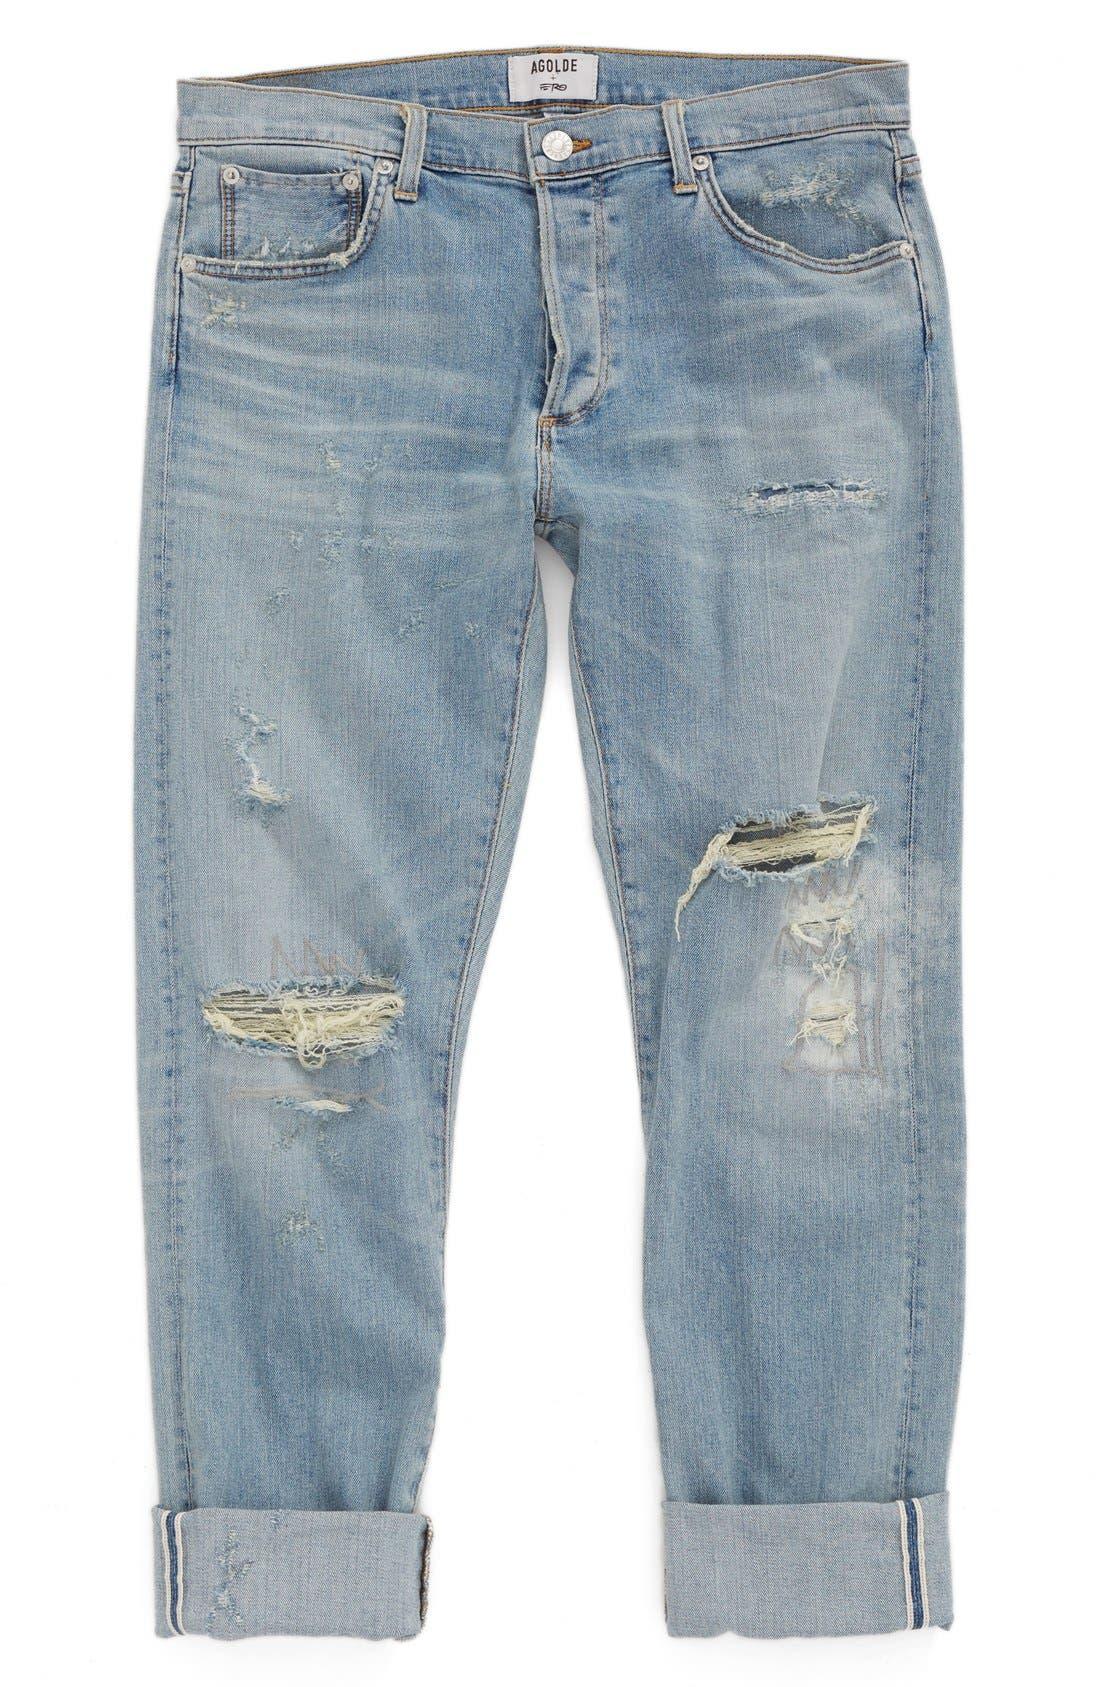 Alternate Image 1 Selected - AGOLDE Skinny Fit Distressed Jeans (Pixx) (Men)